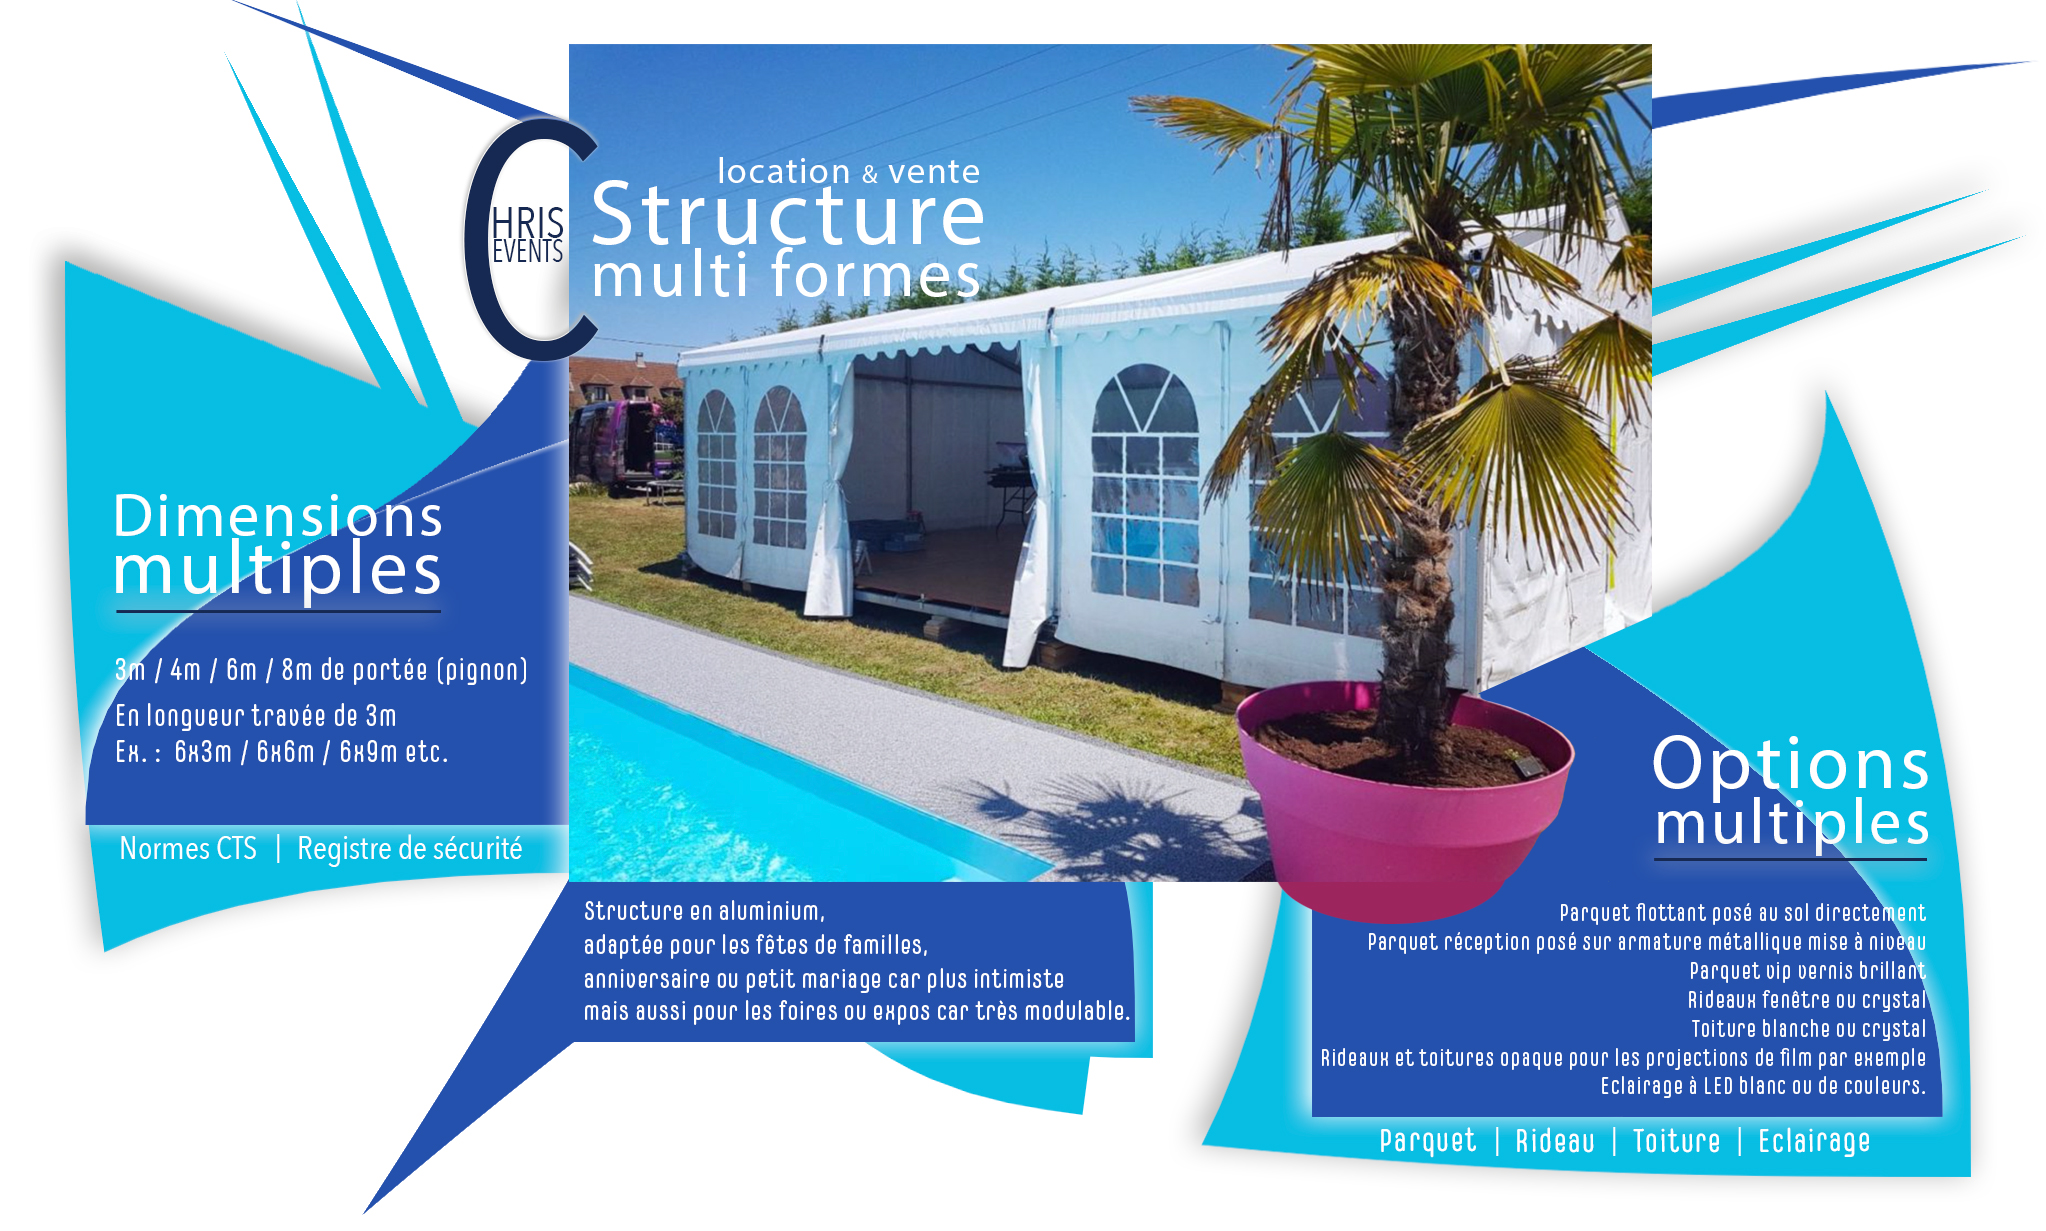 Chris Events location structure multiforme anniversaire, expo